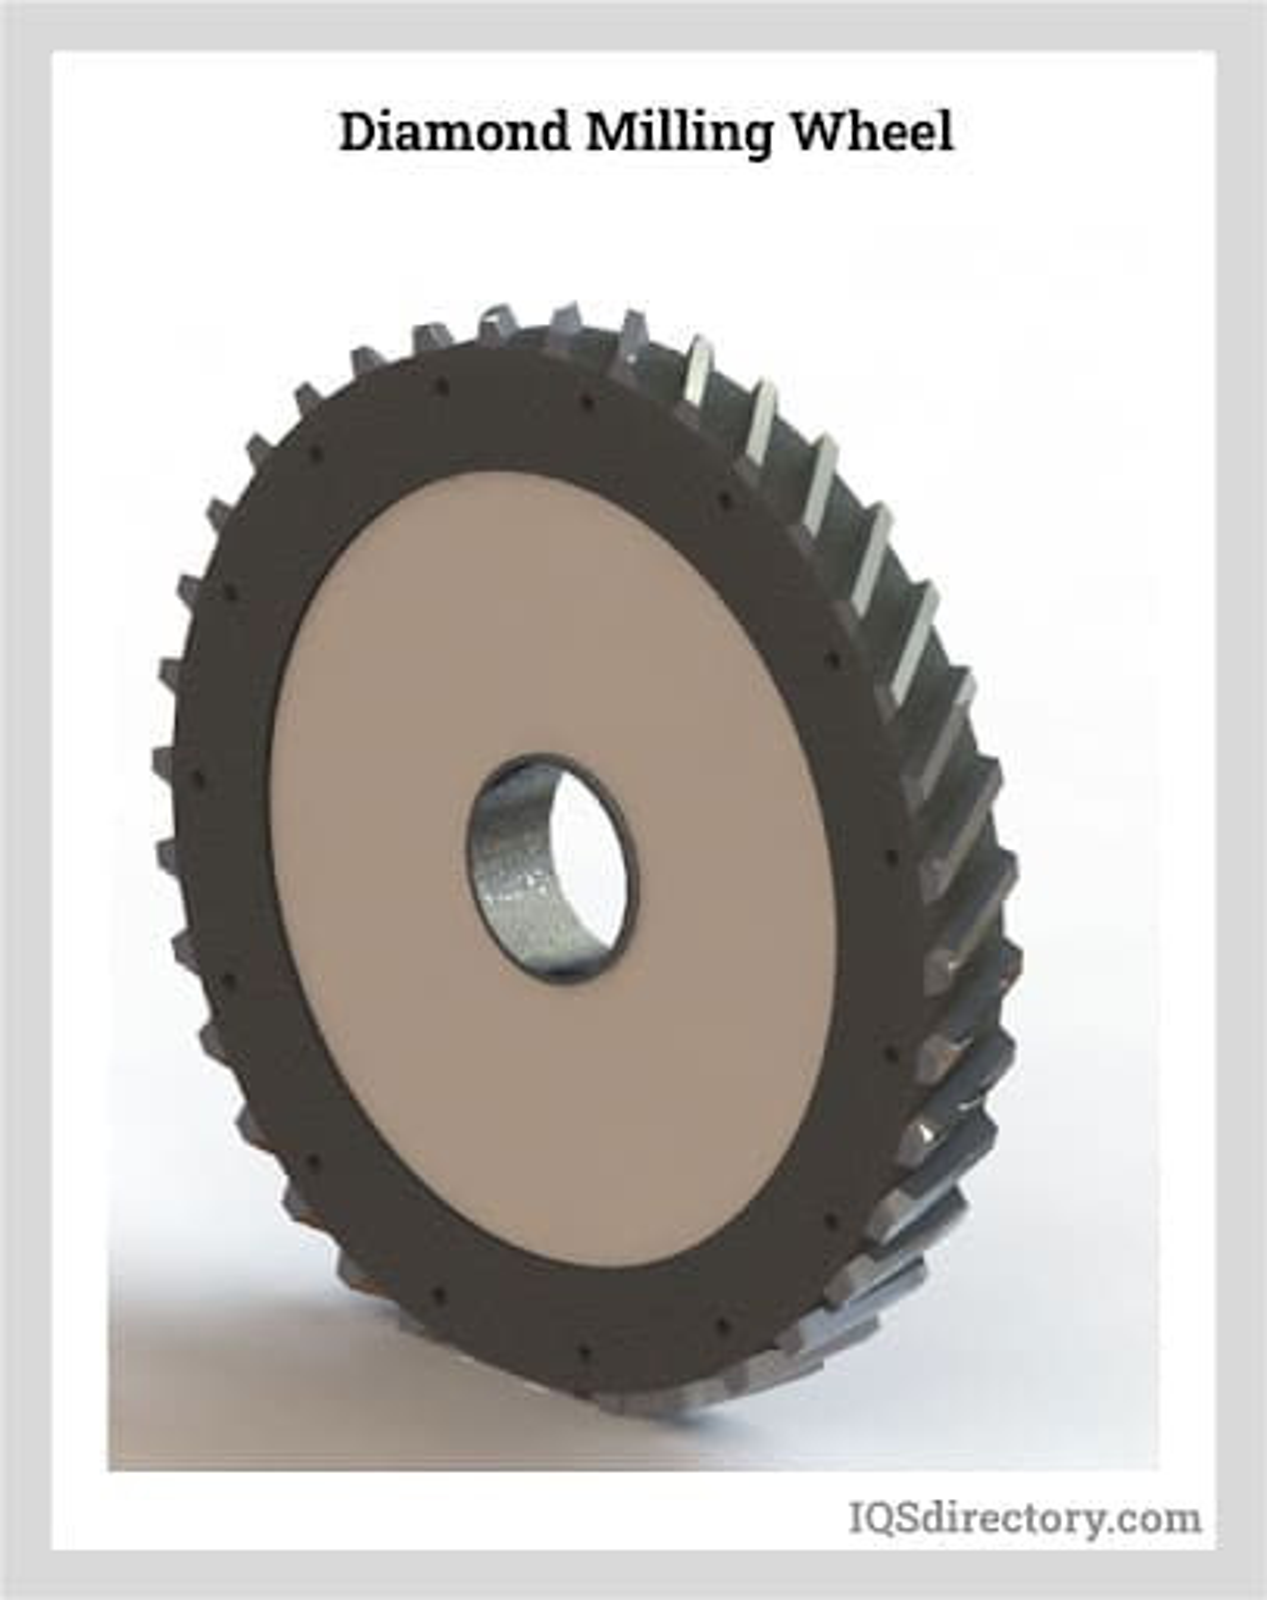 Diamond Milling Wheel